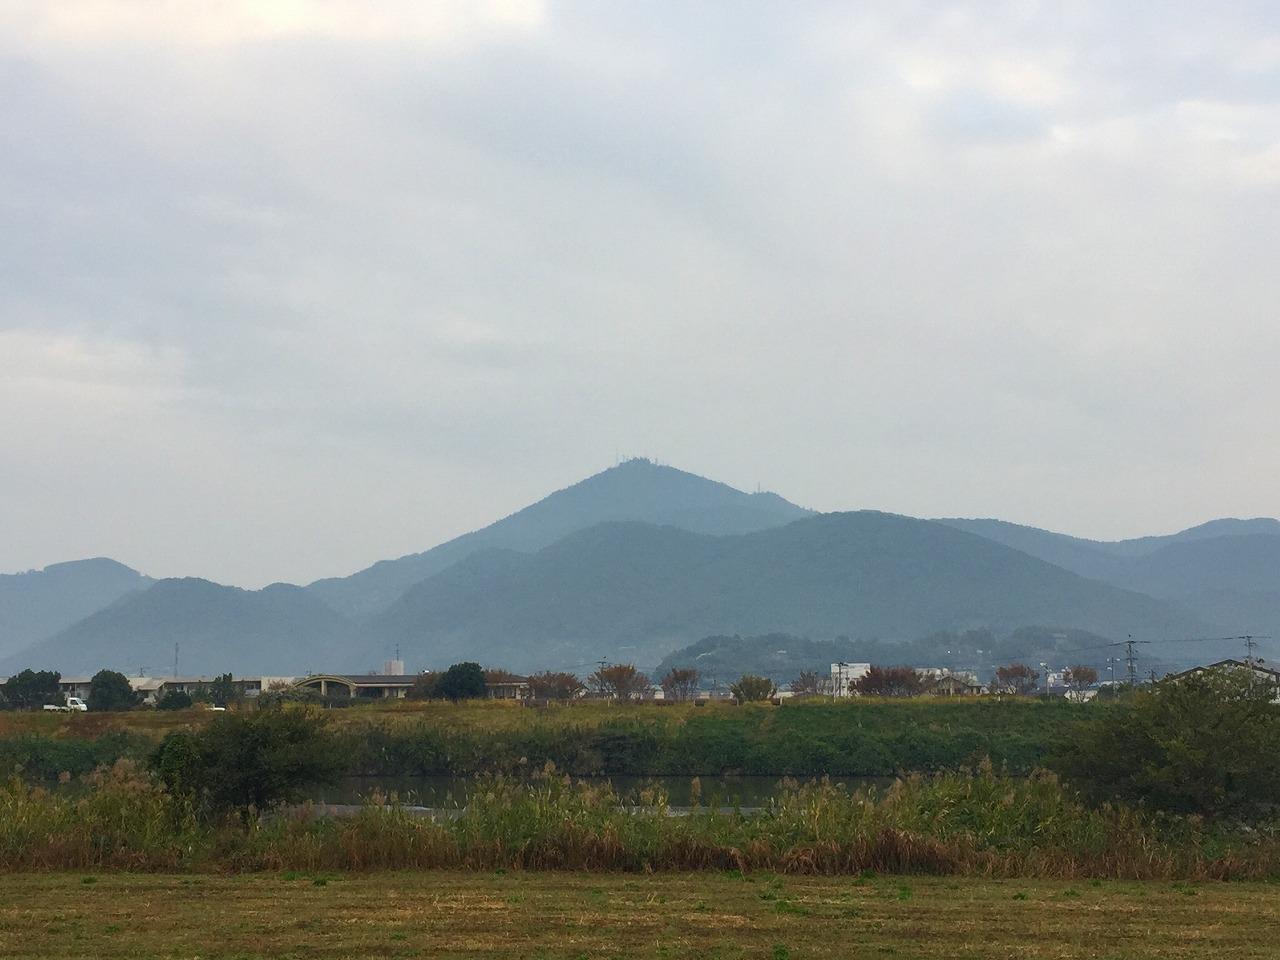 2016.11.8 今朝の金峰山